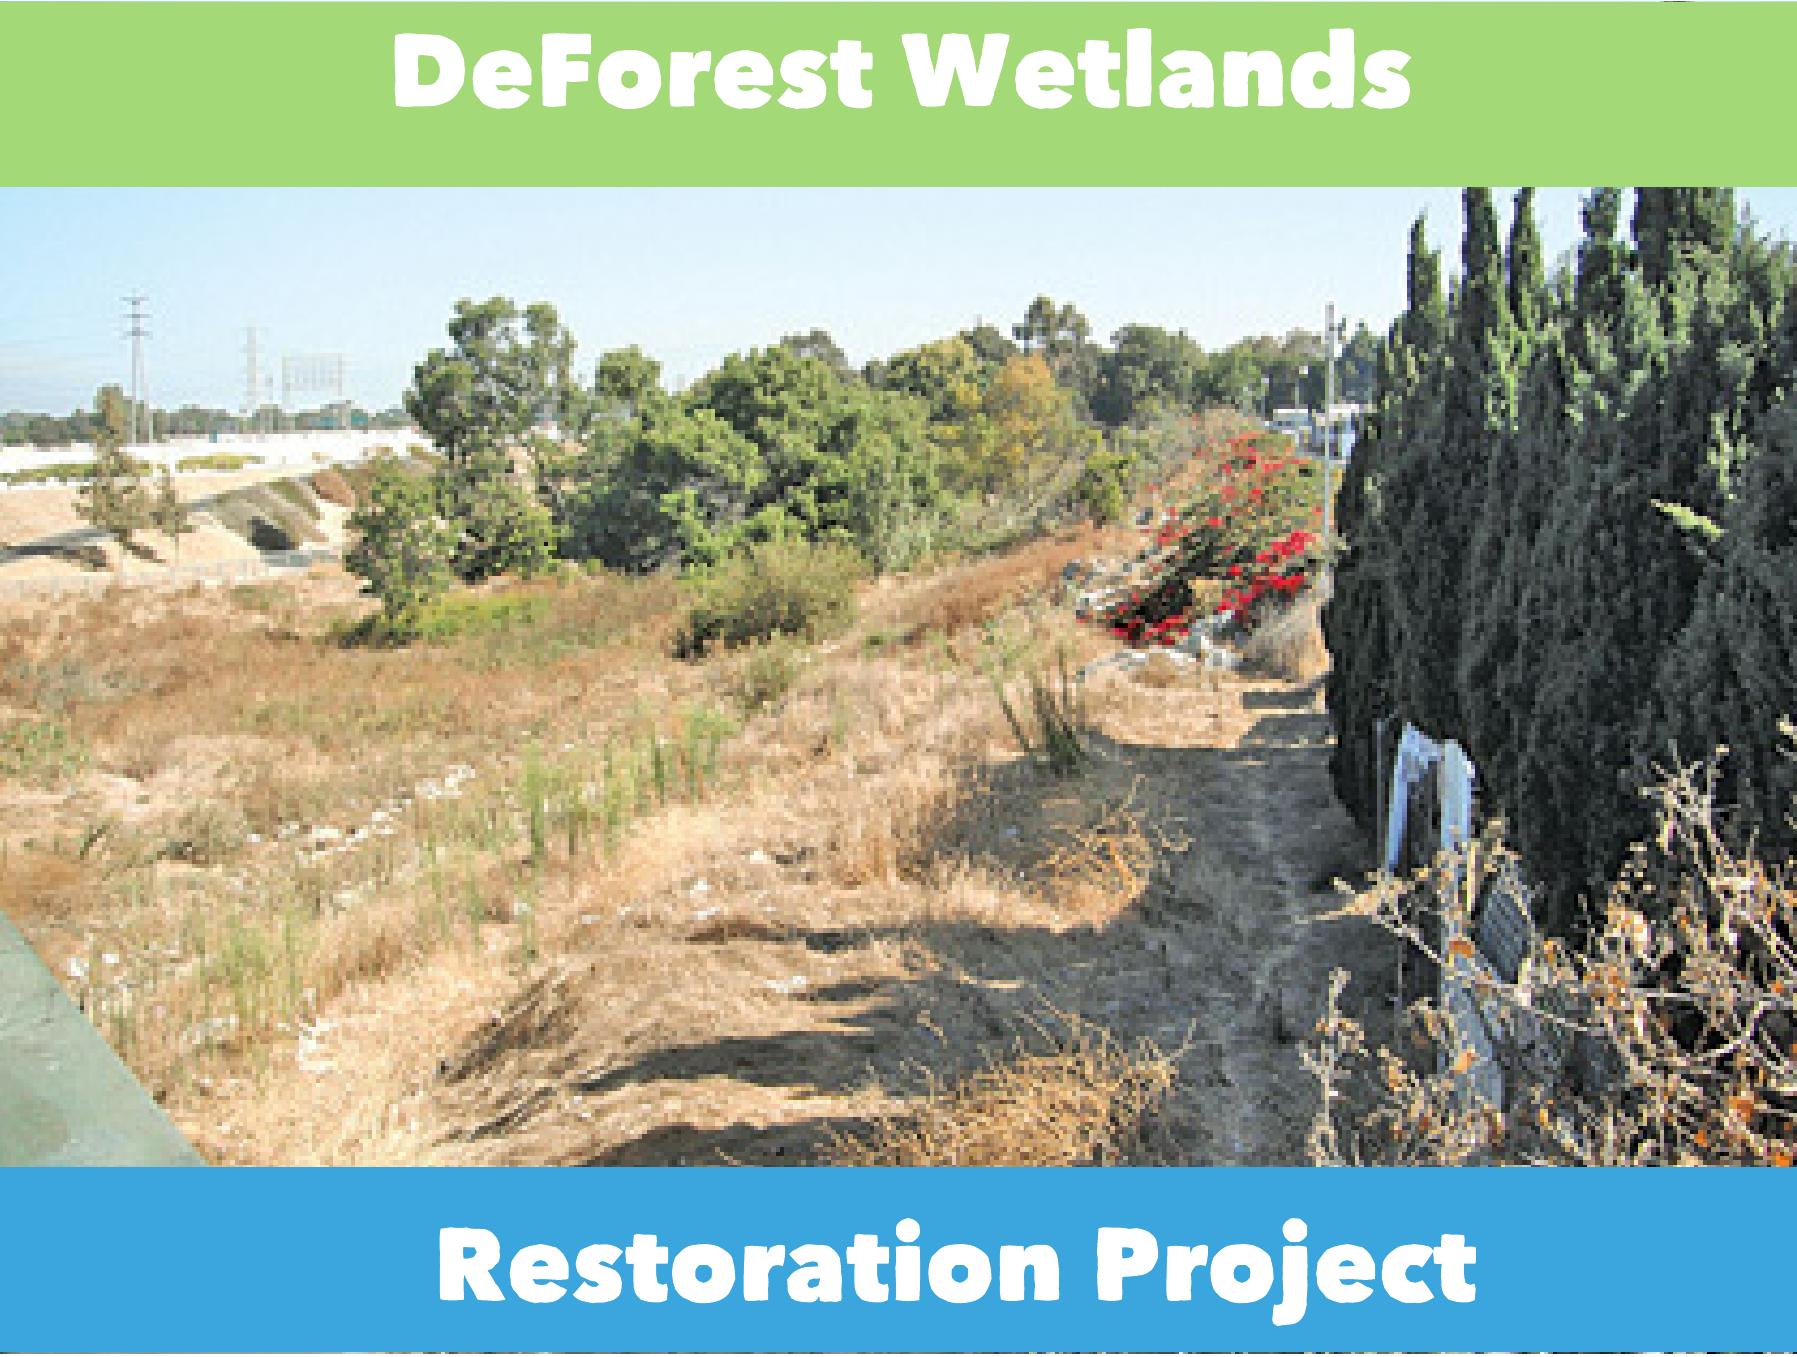 De_Forest_Wetlands_Final_Approval_Image.png